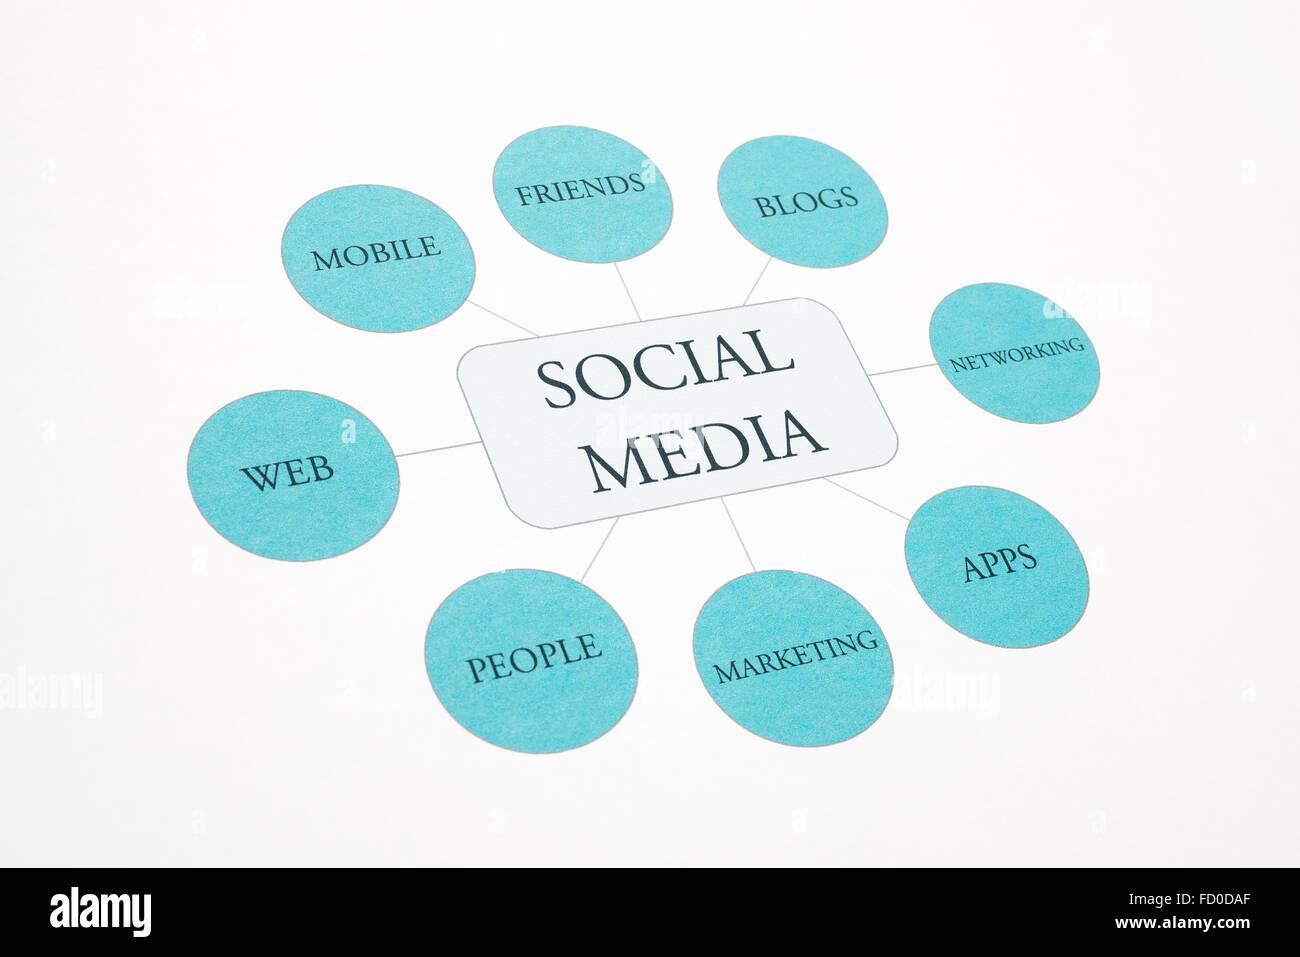 Internet Connection Word Diagram Concept Stockfotos Social Media Network Business Konzept Flussdiagramm Fotografie Blau Getnt Stockbild